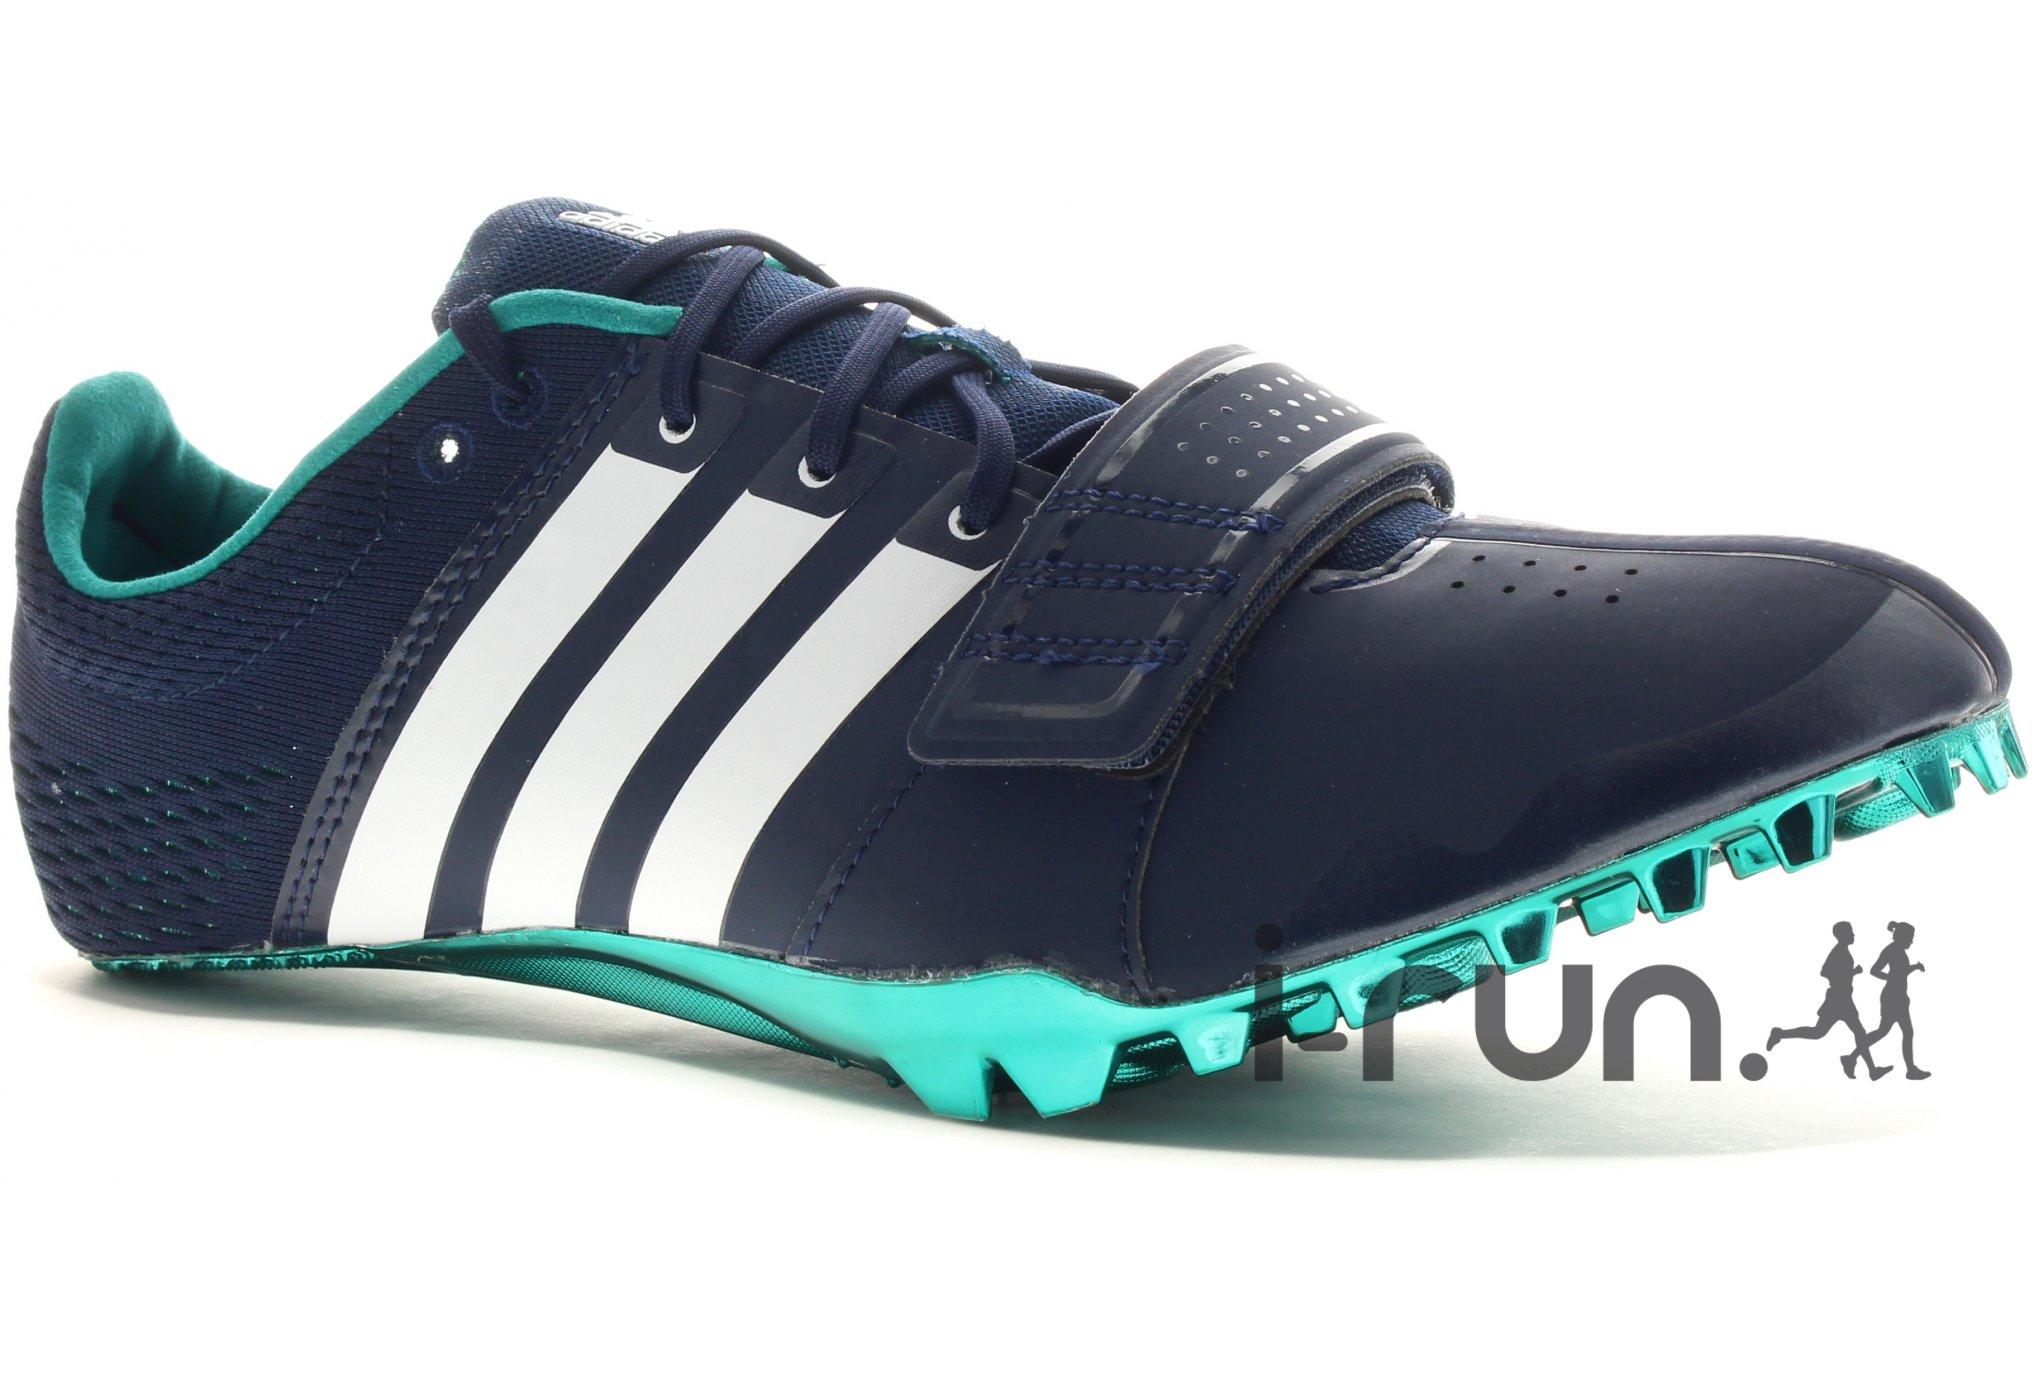 chaussures athletisme pointes adidas,adidas adizero Ambition